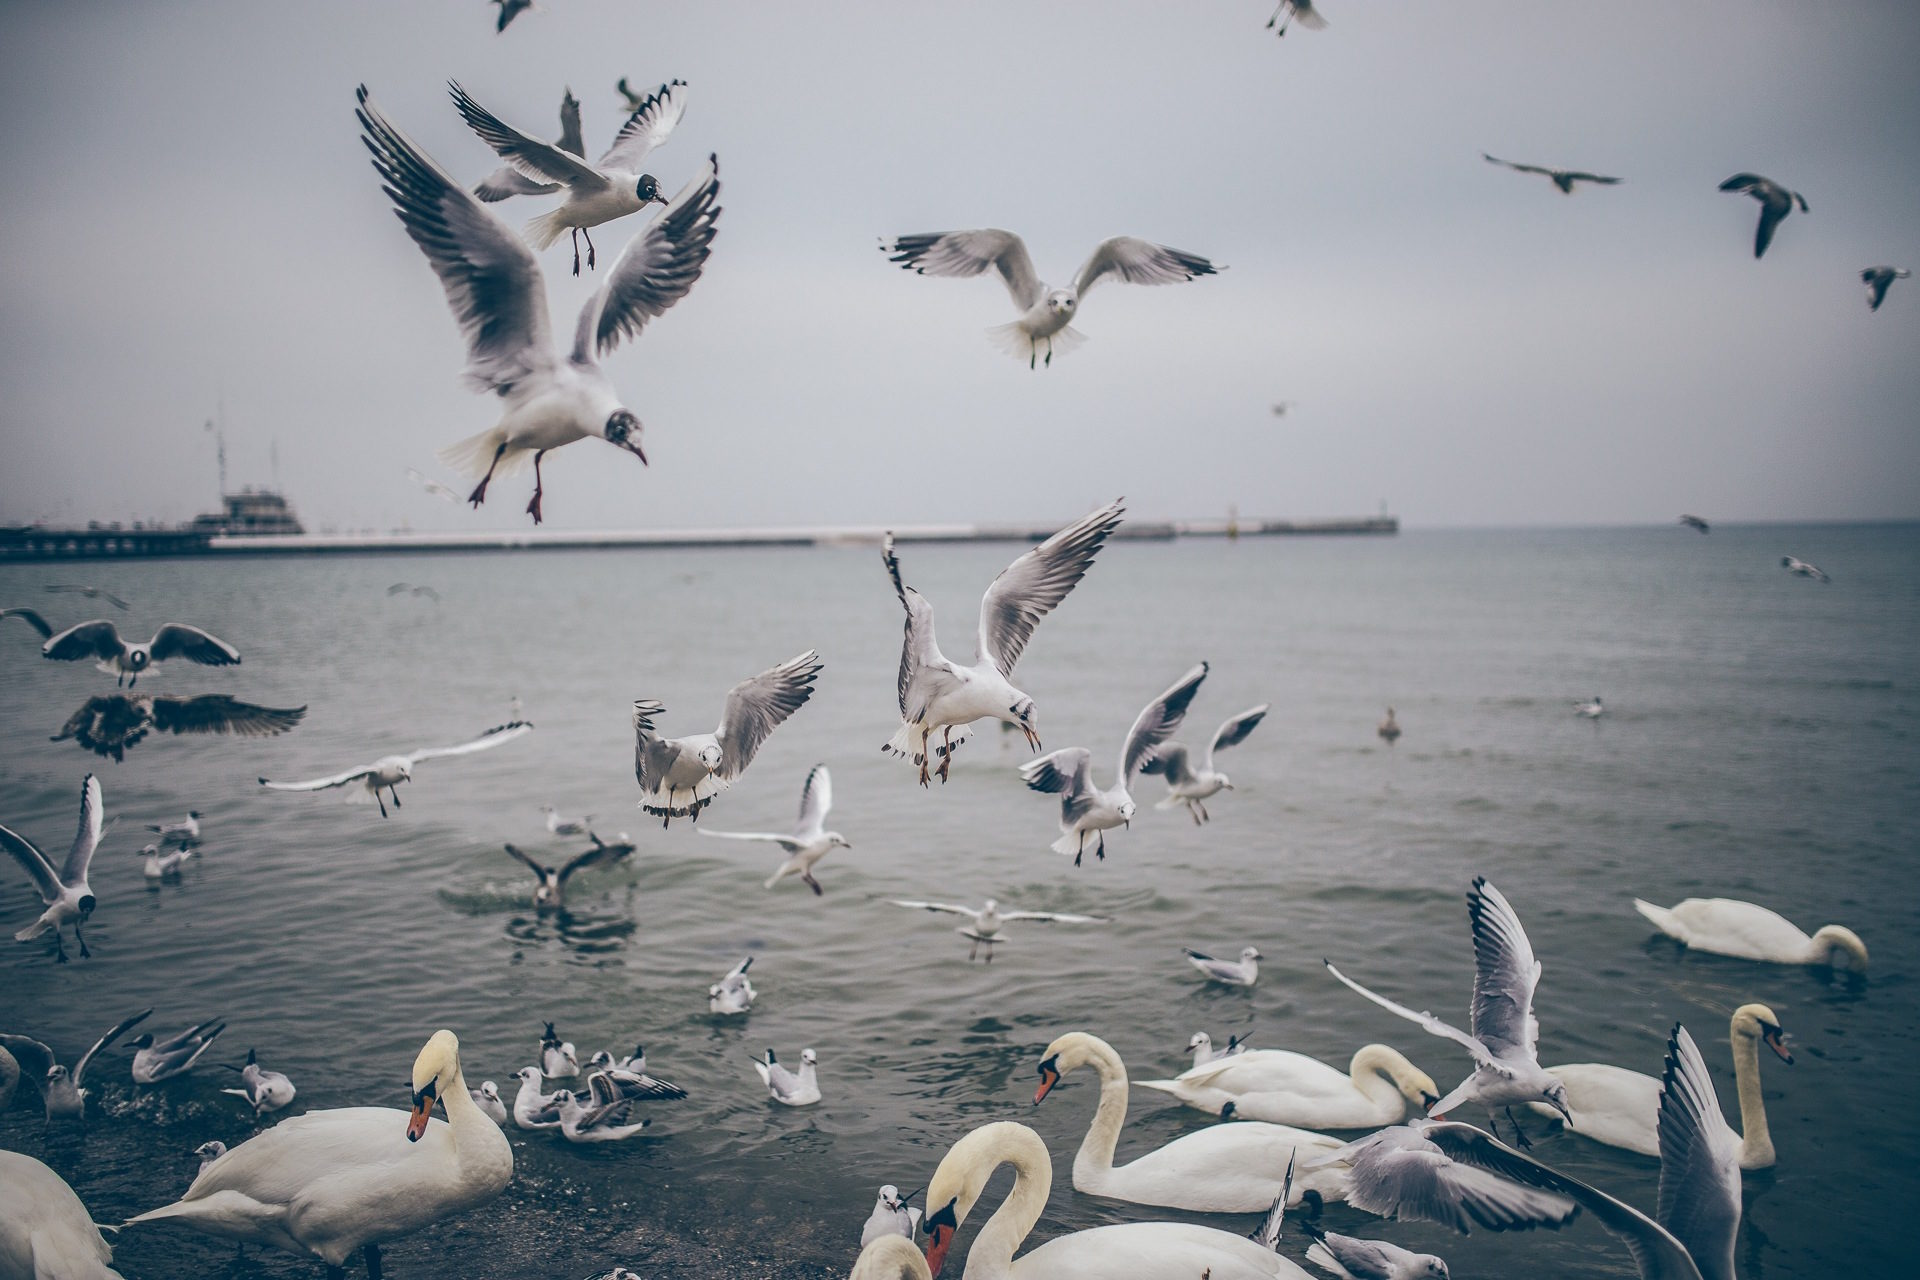 pájaros, cisnes, gaviotas, agua, supervivencia - Fondos de Pantalla HD - professor-falken.com